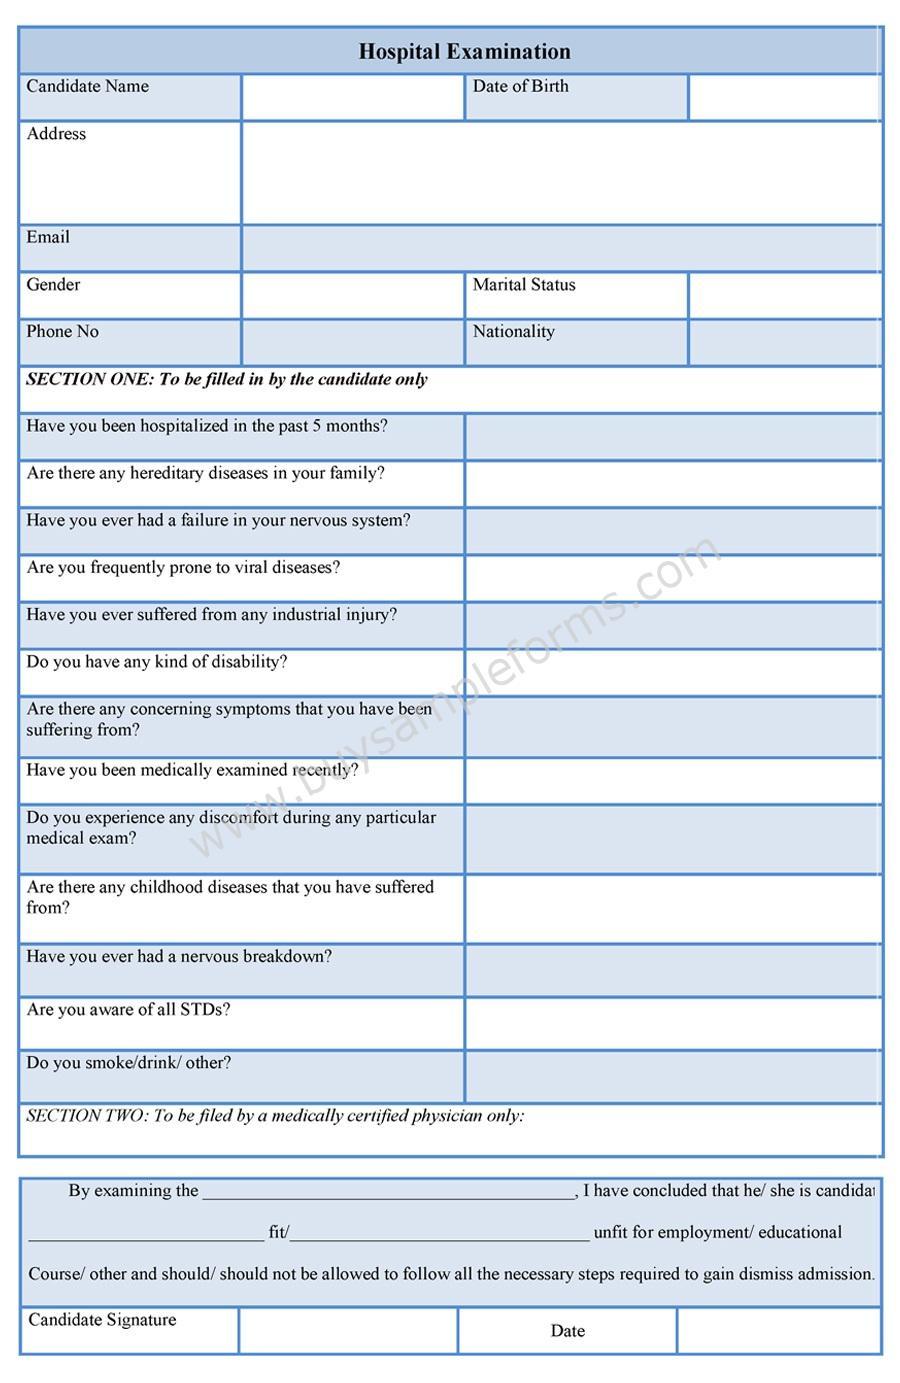 Hospital Examination Form sample